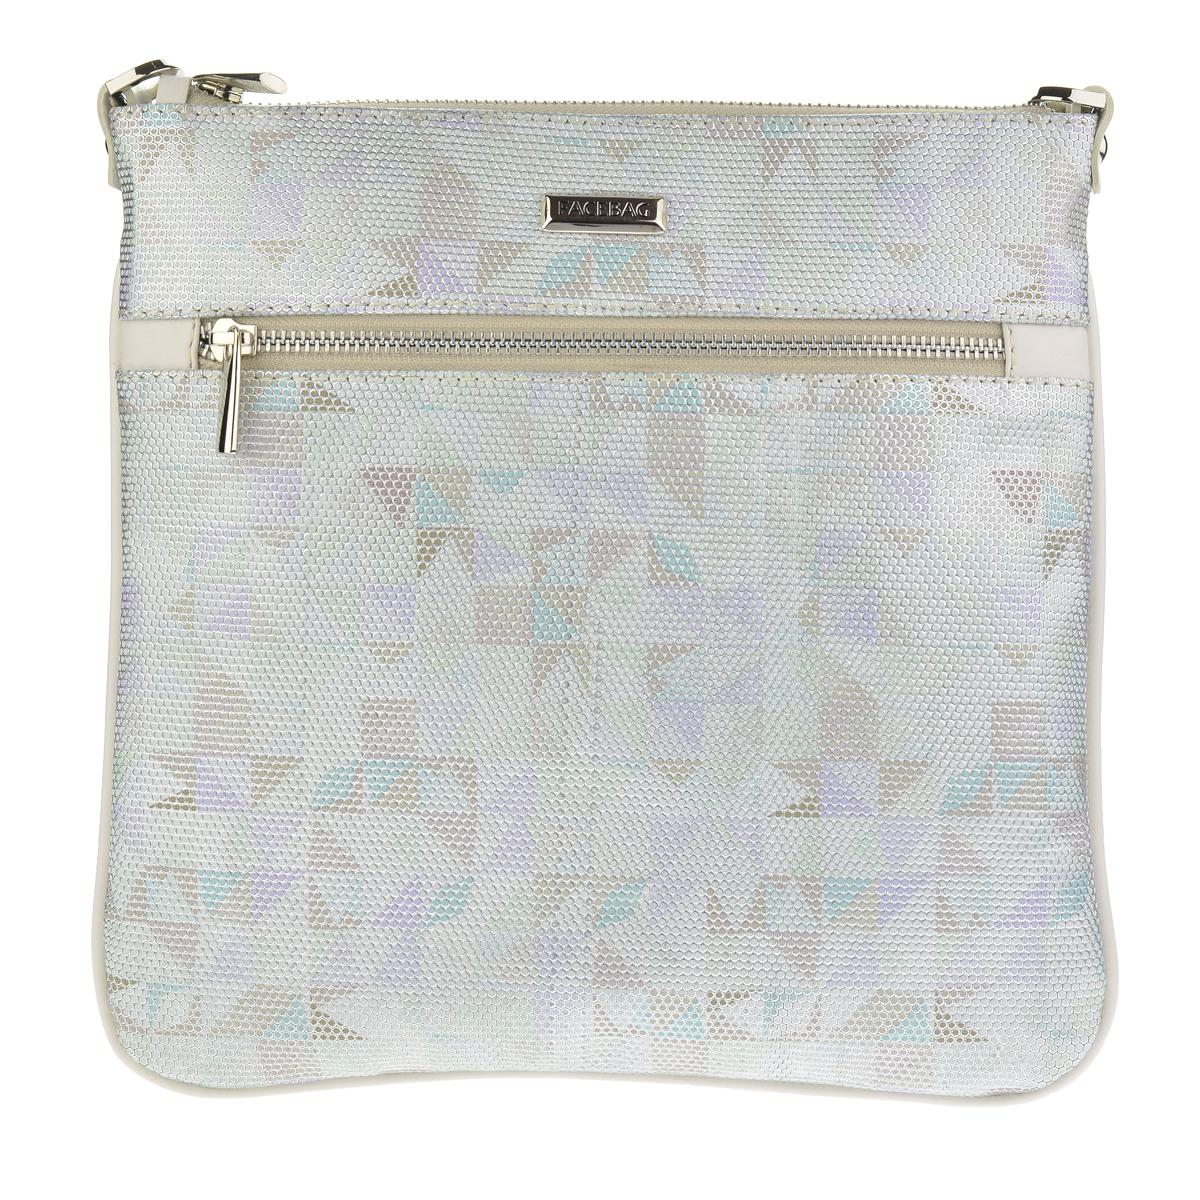 Dámská kožená kabelka FACEBAG VILMA - Mozaika + béžová  1bcf360420f